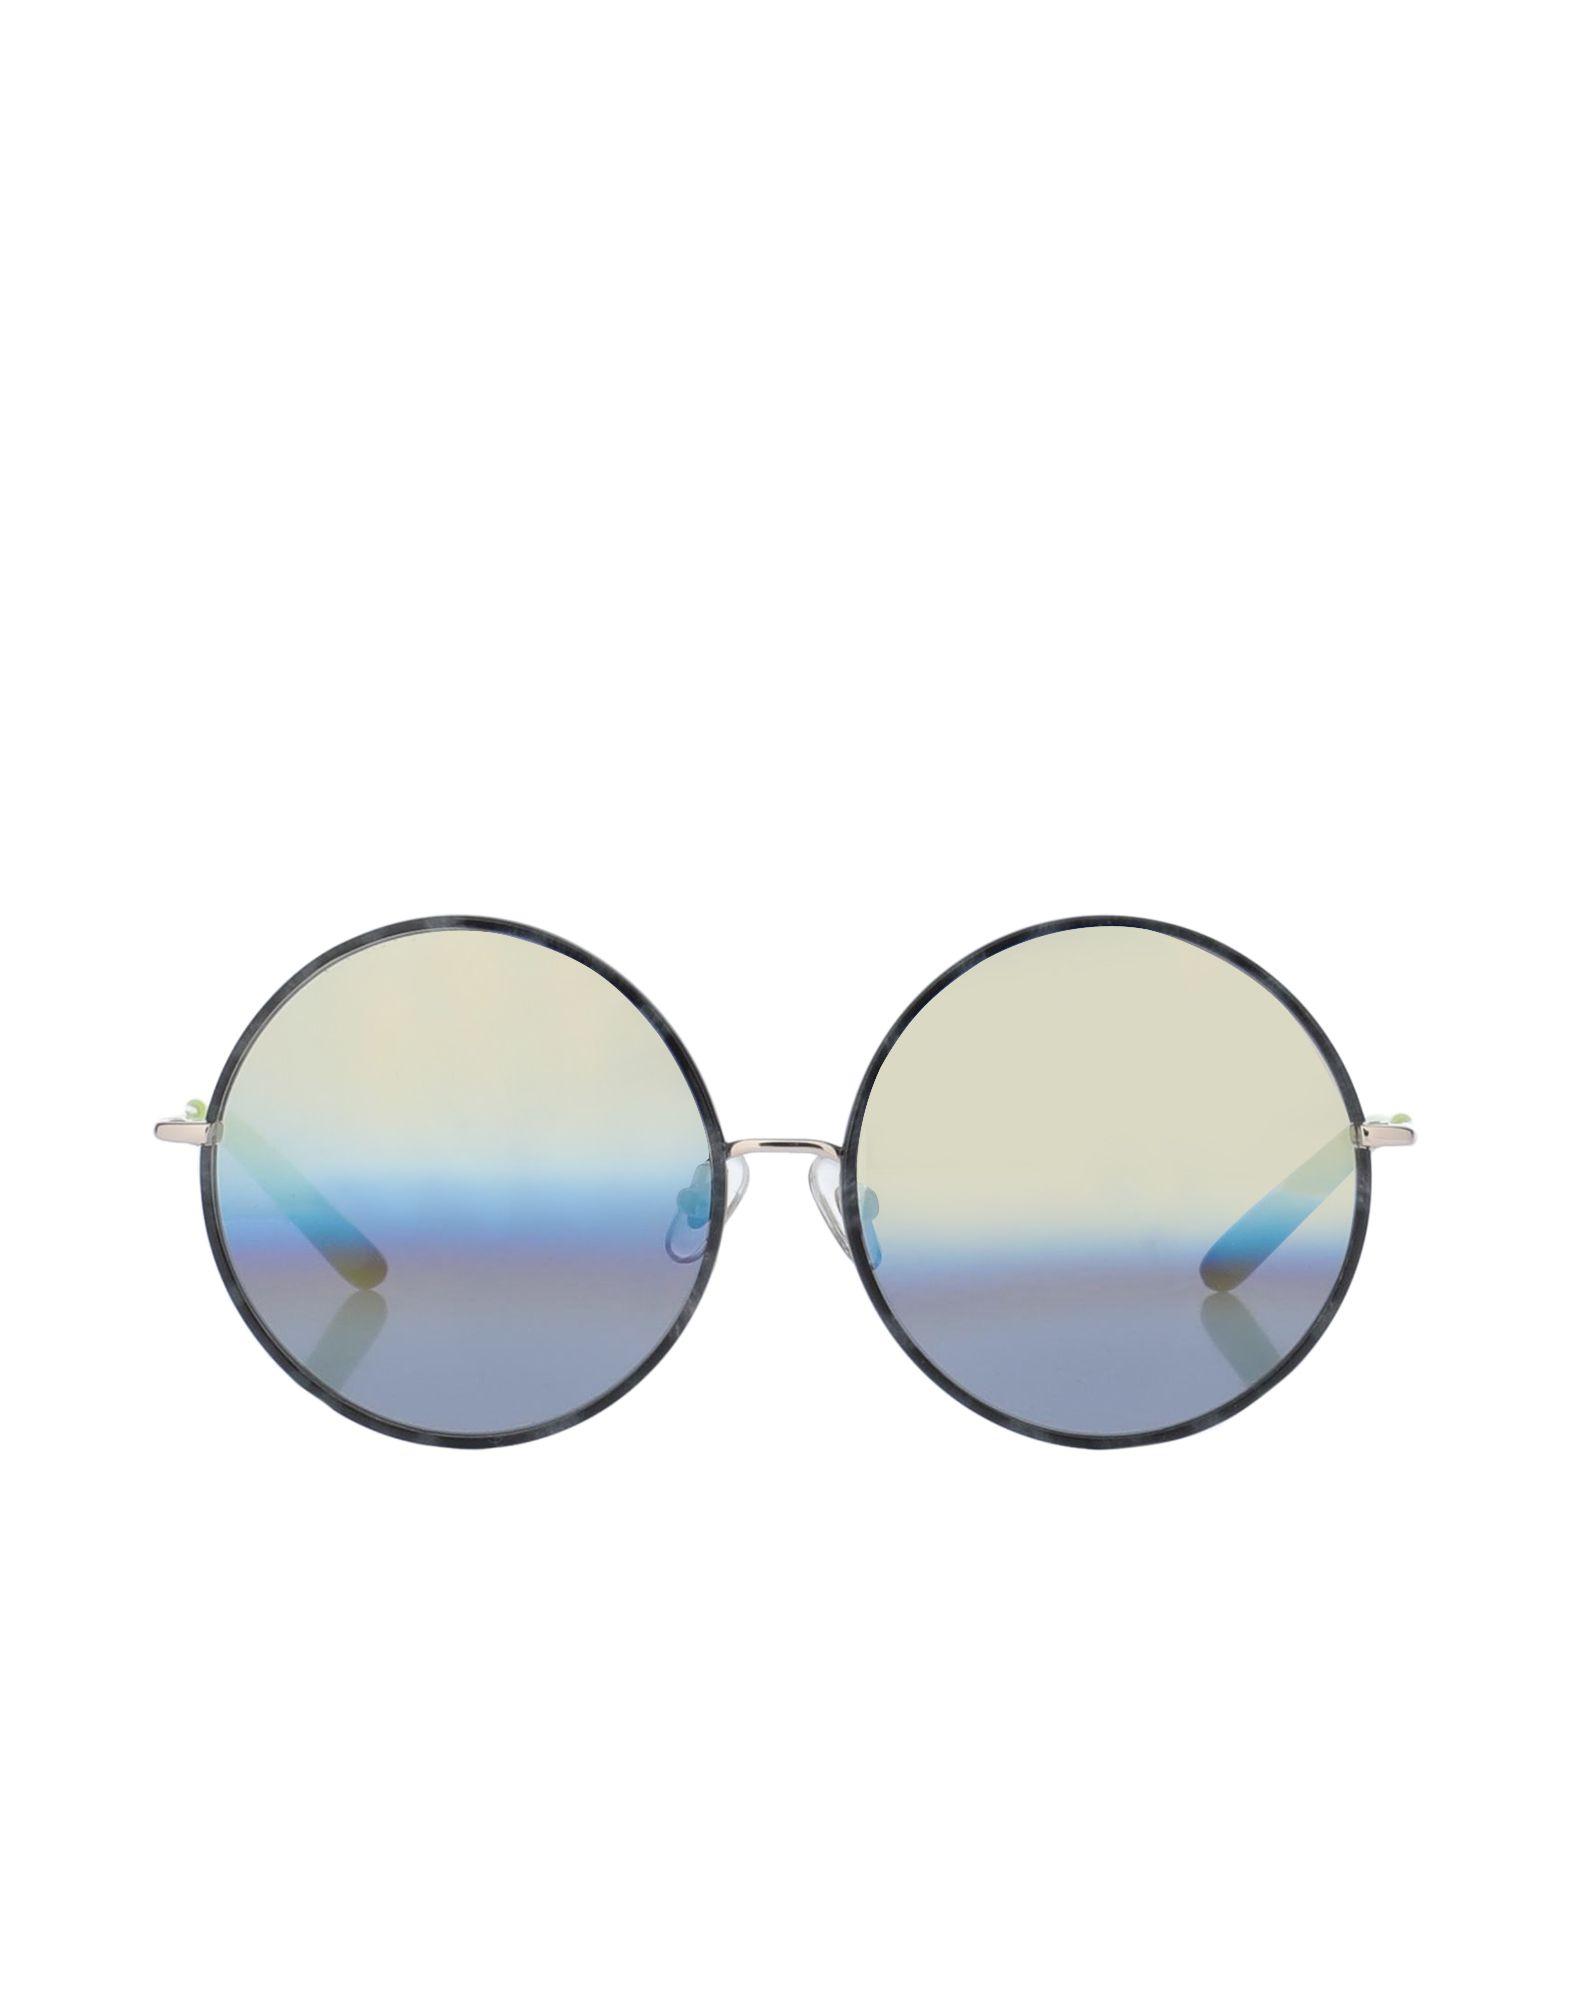 LINDA FARROW x MATTHEW WILLIAMSON Солнечные очки